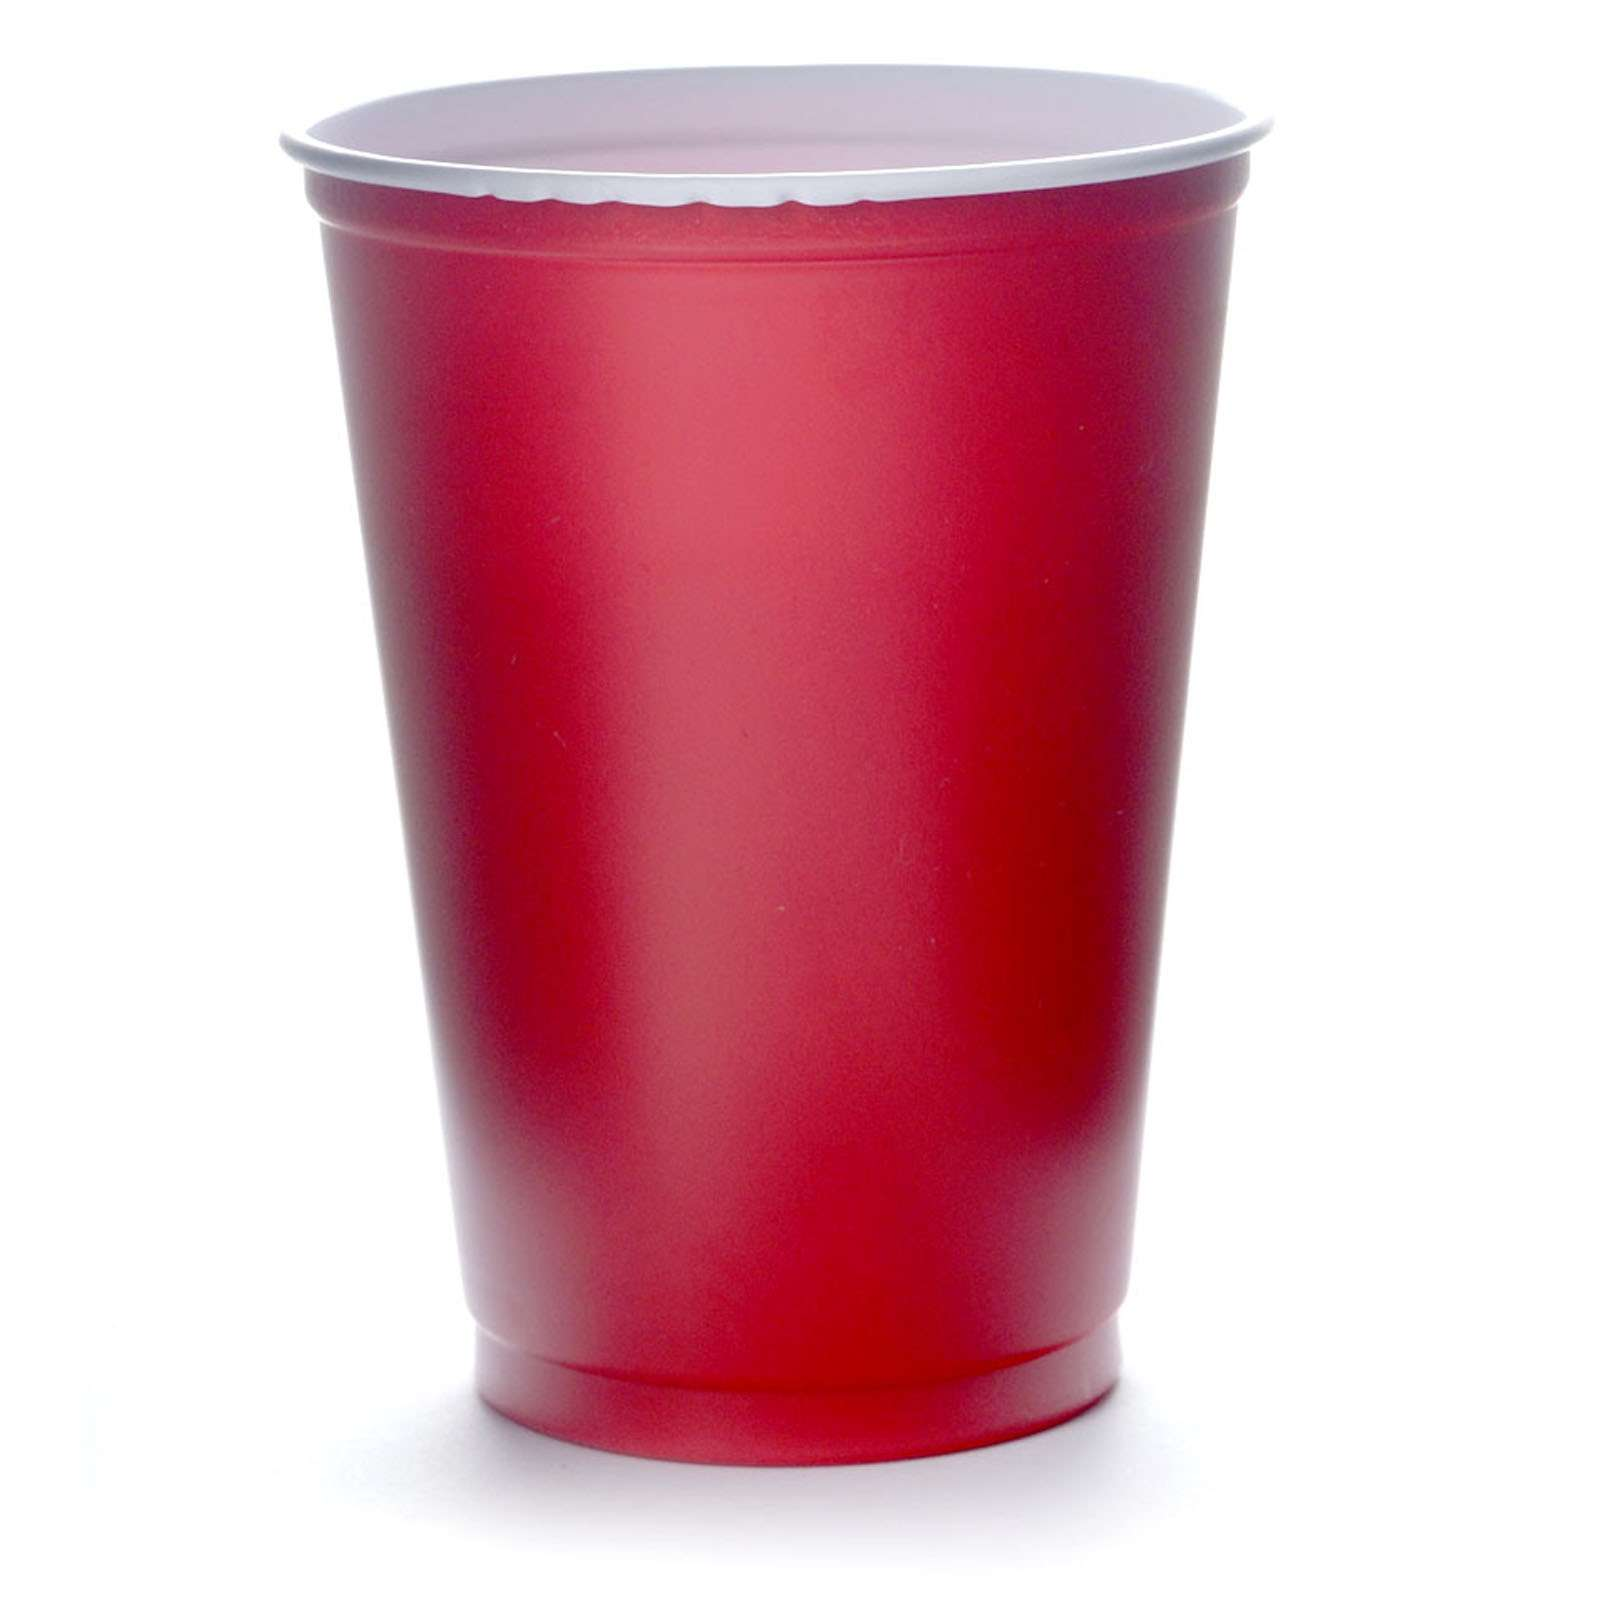 Solo Cups 16oz Rote Becher 473 ml Red Cup Original USA 100 Trinkbecher